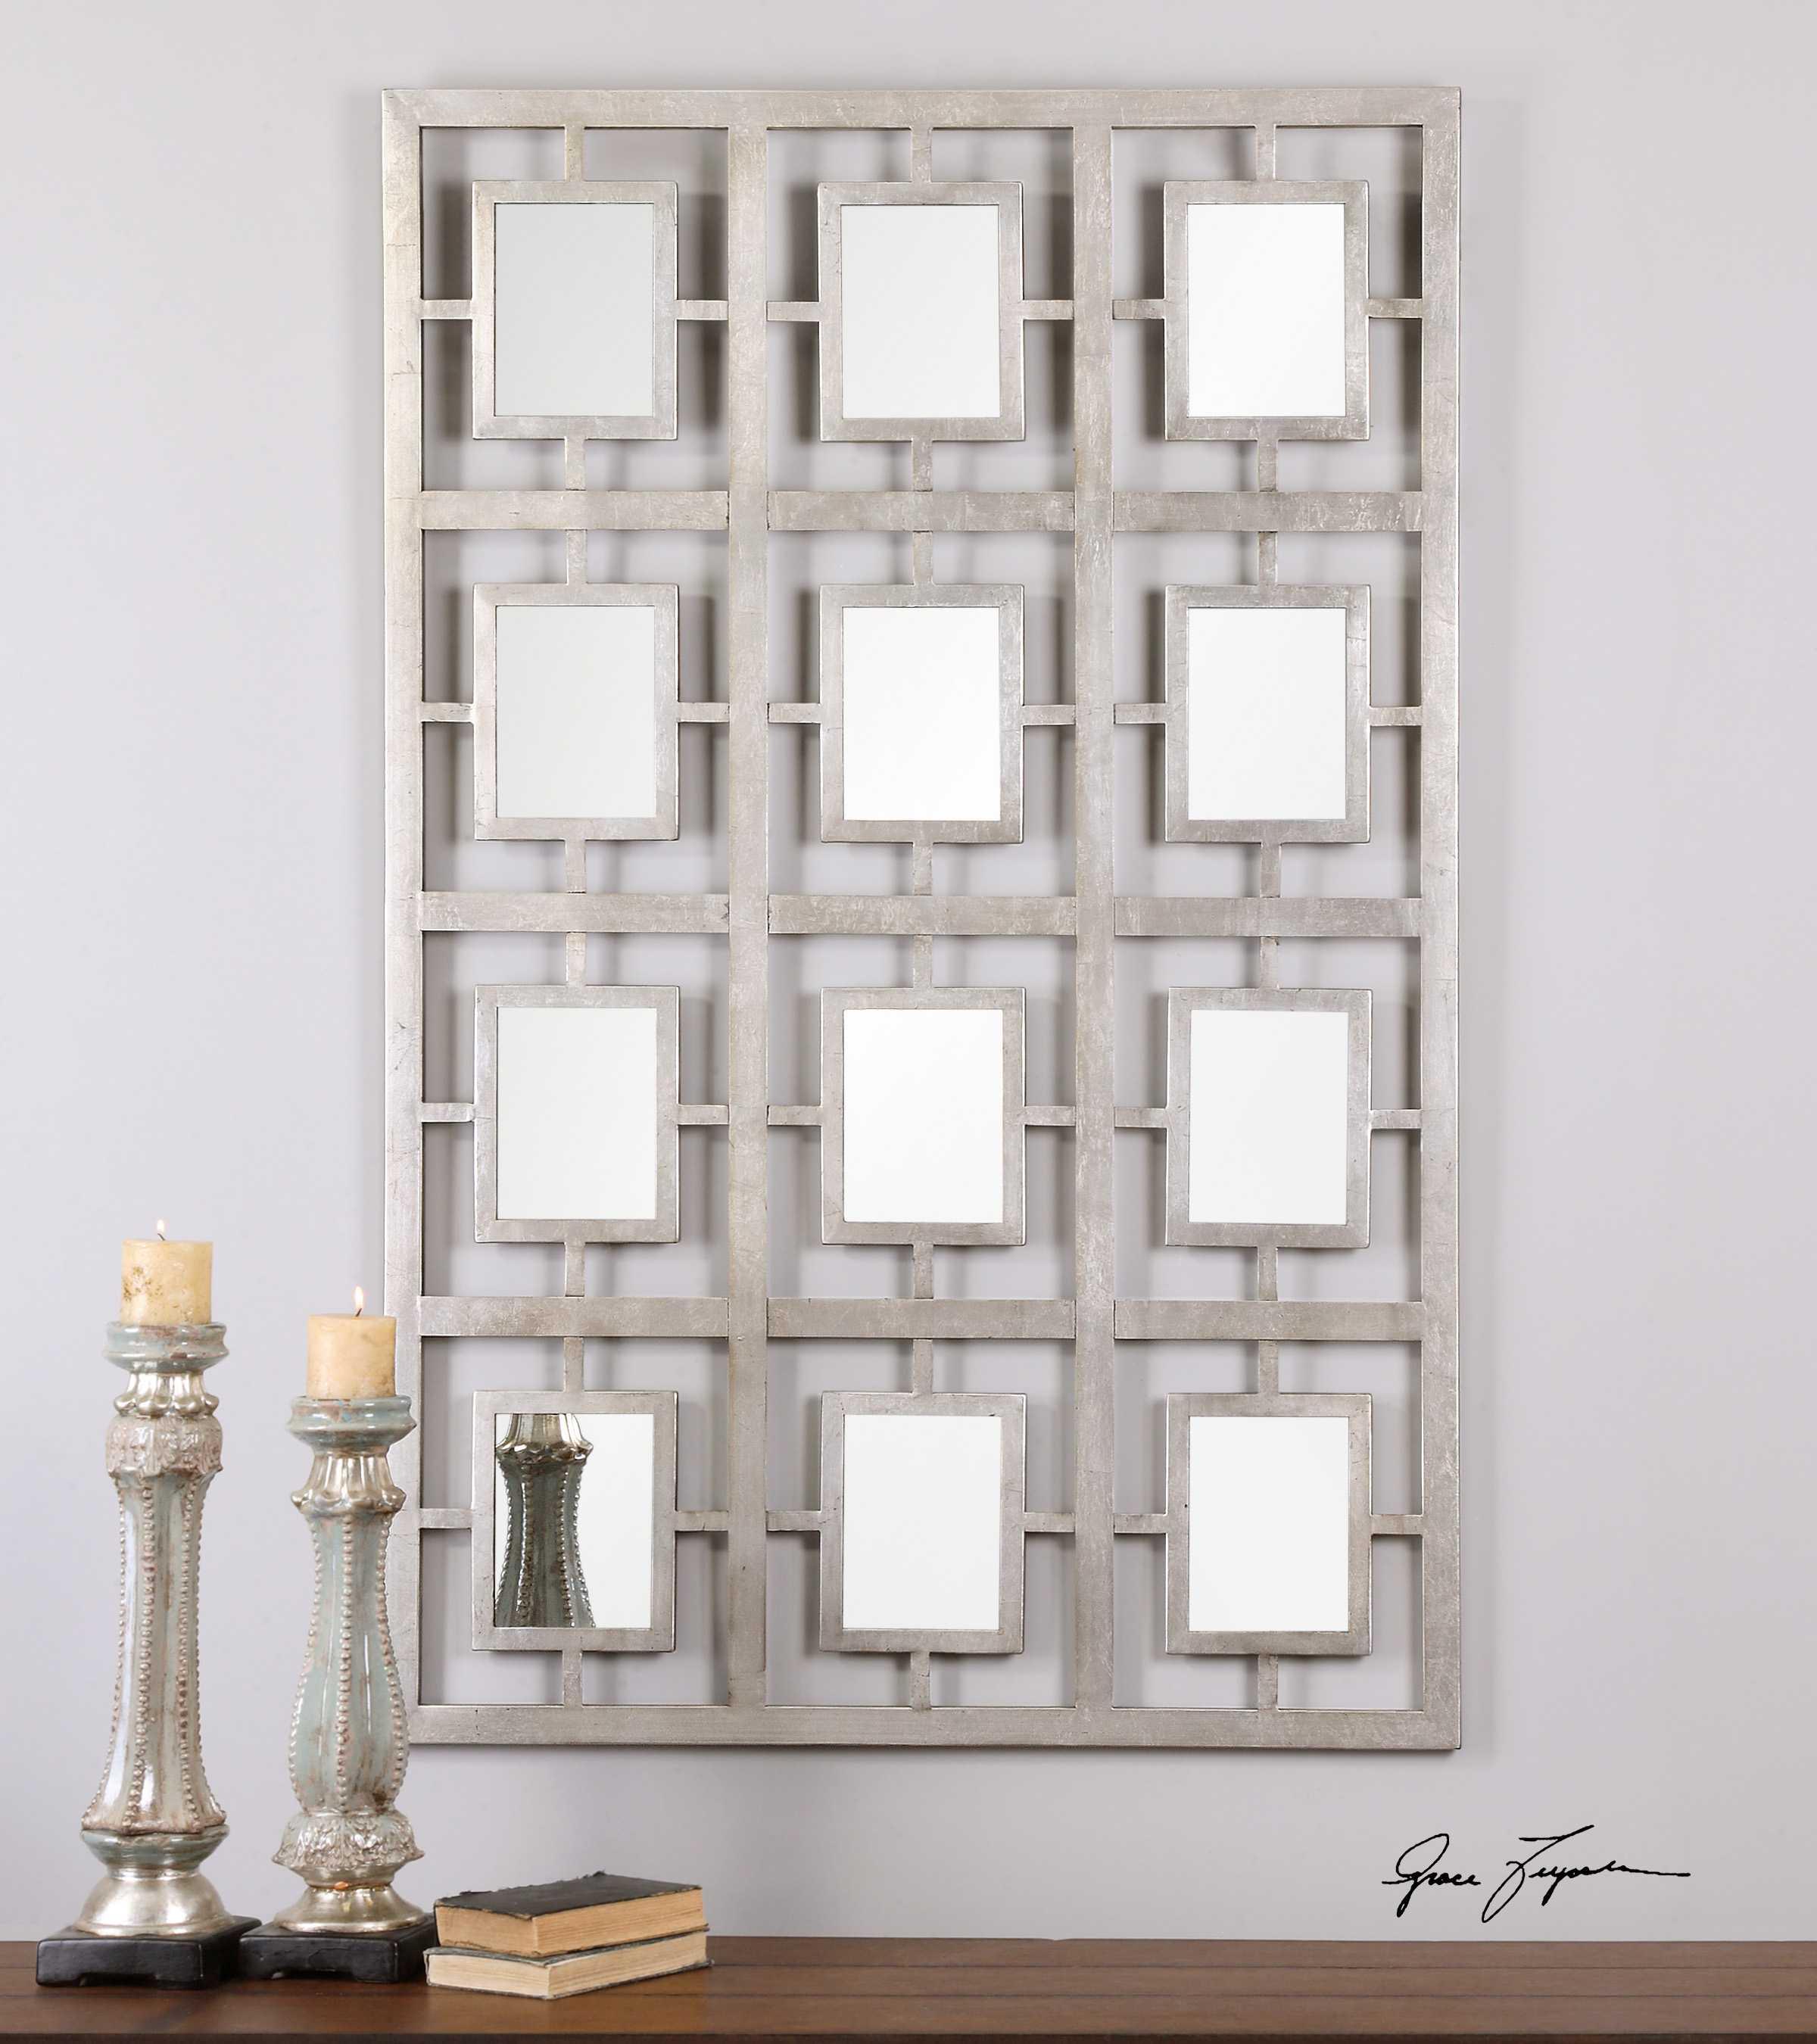 Uttermost dodici 40 x 60 silver wall mirror 13872 for Miroir 60 x 40